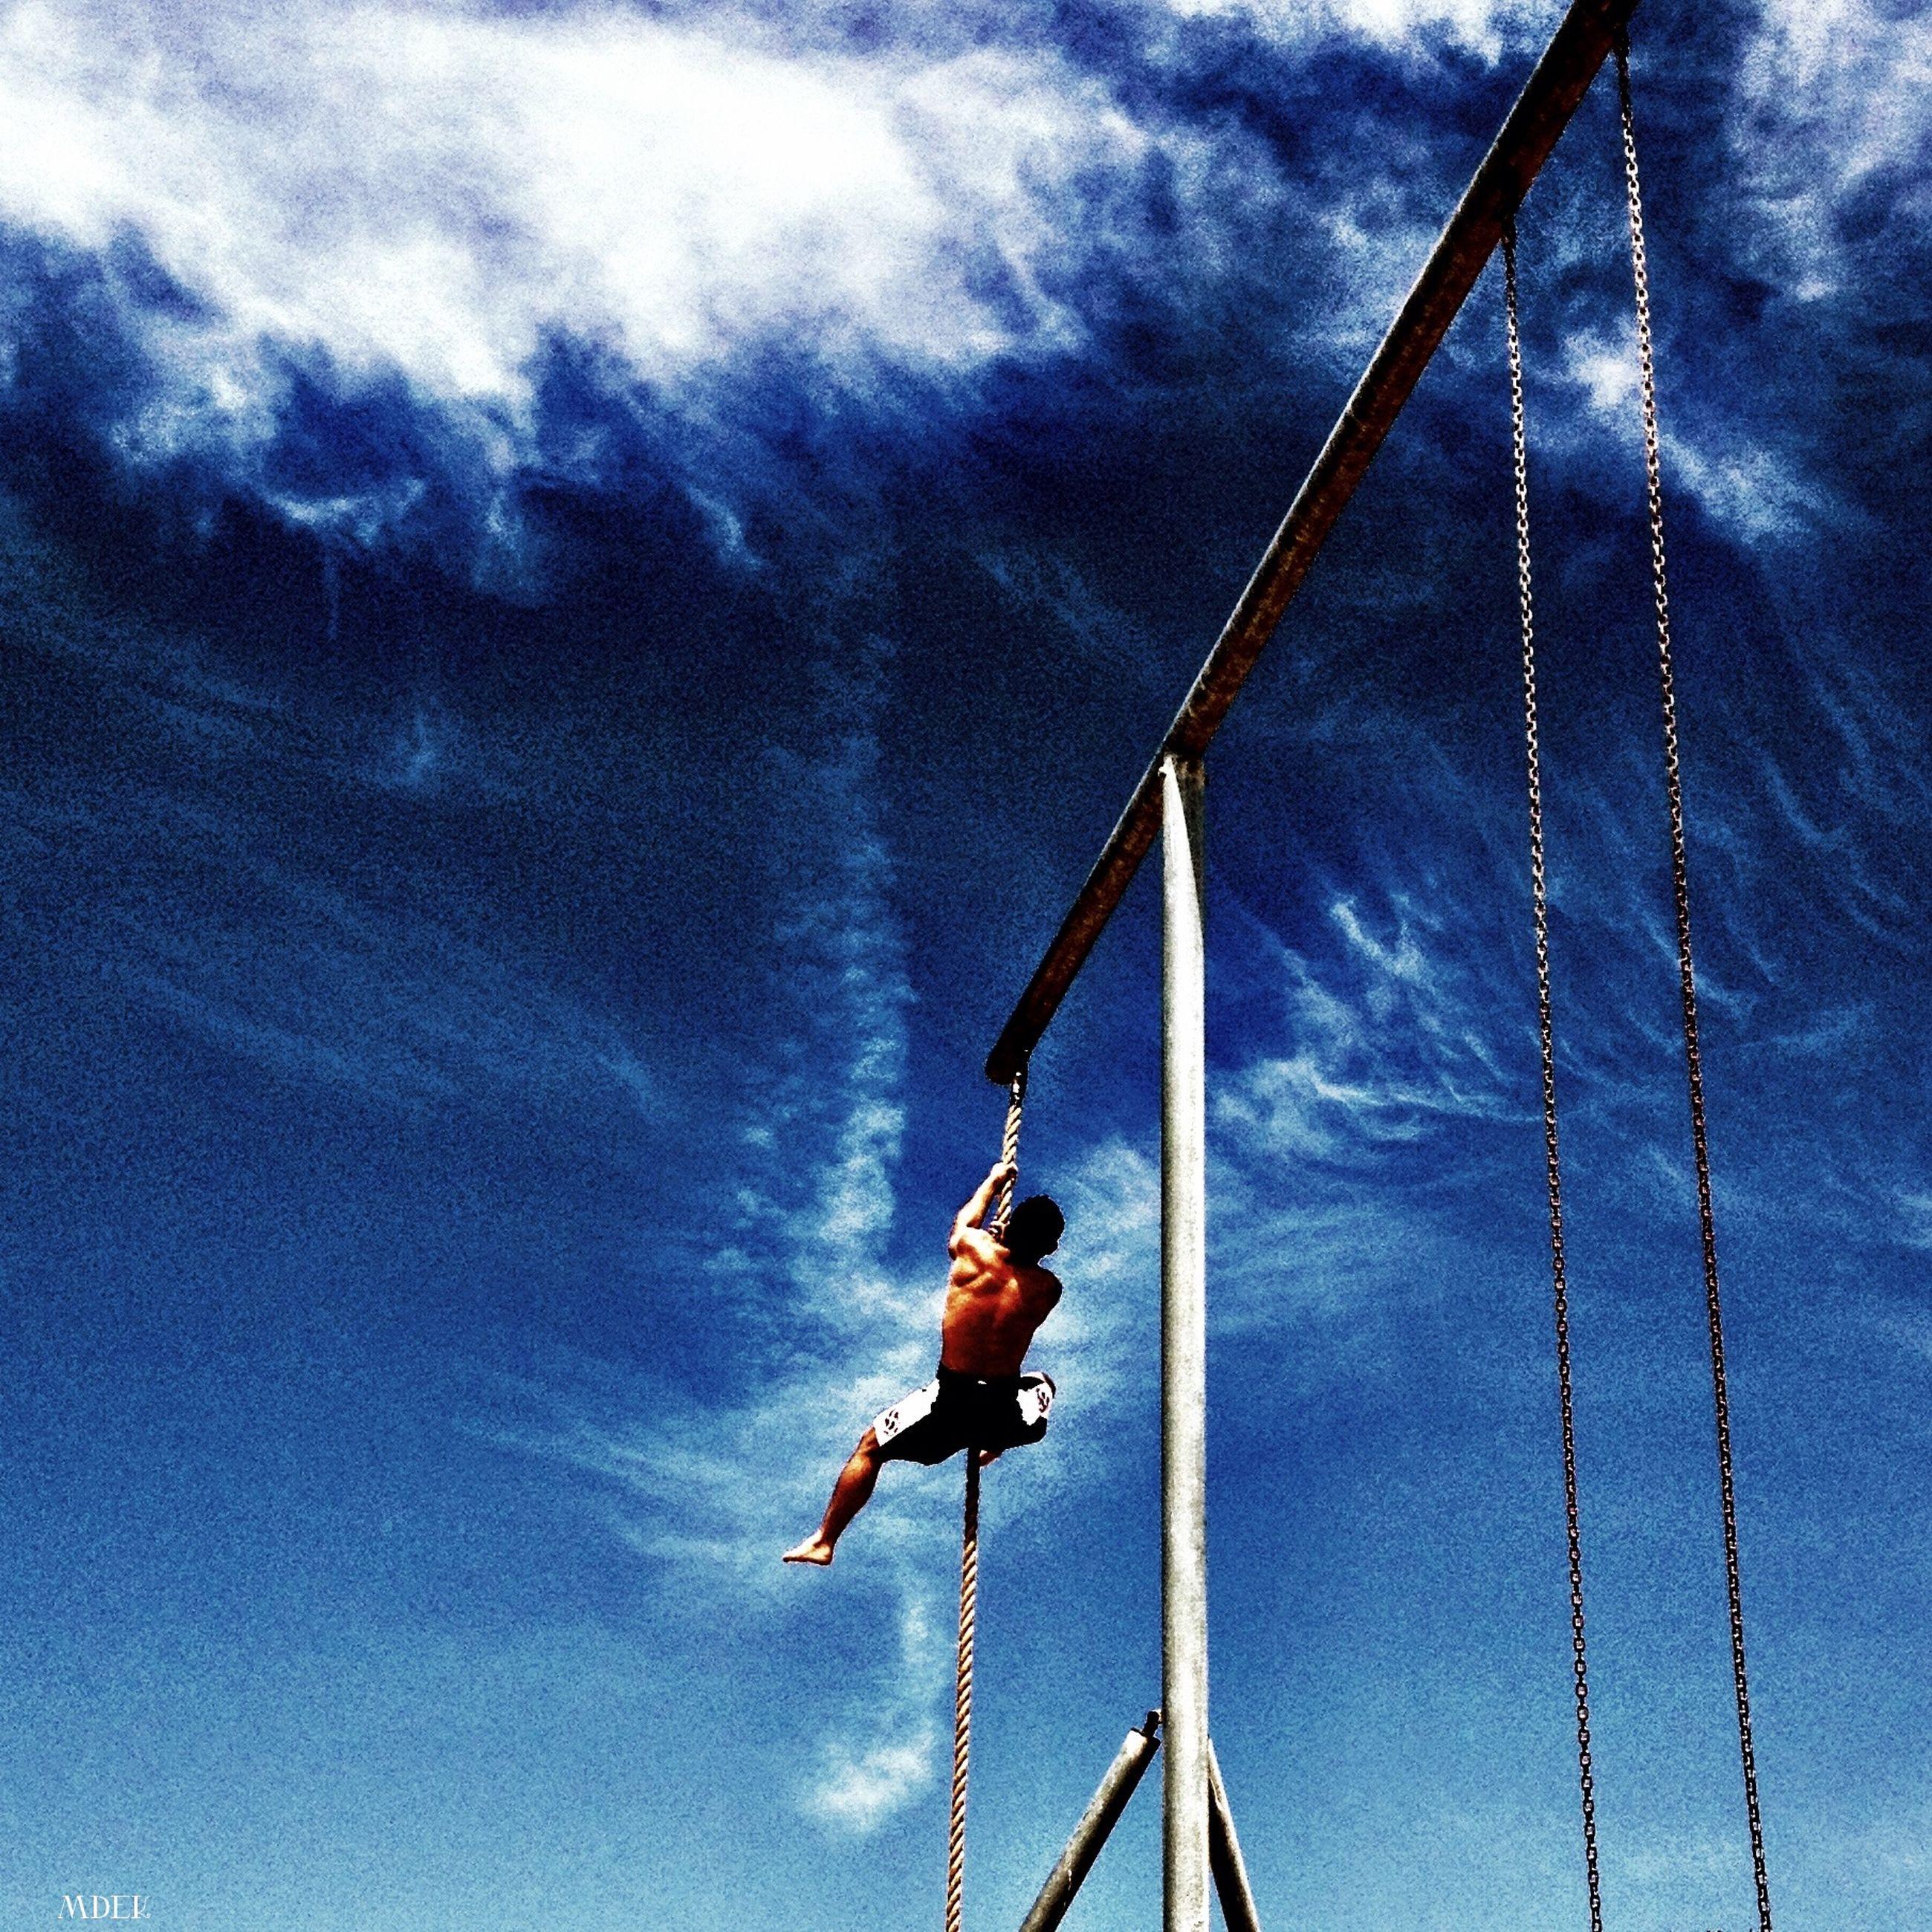 sky, low angle view, leisure activity, lifestyles, cloud - sky, men, nautical vessel, rope, cloudy, cloud, full length, adventure, blue, enjoyment, transportation, fun, day, mast